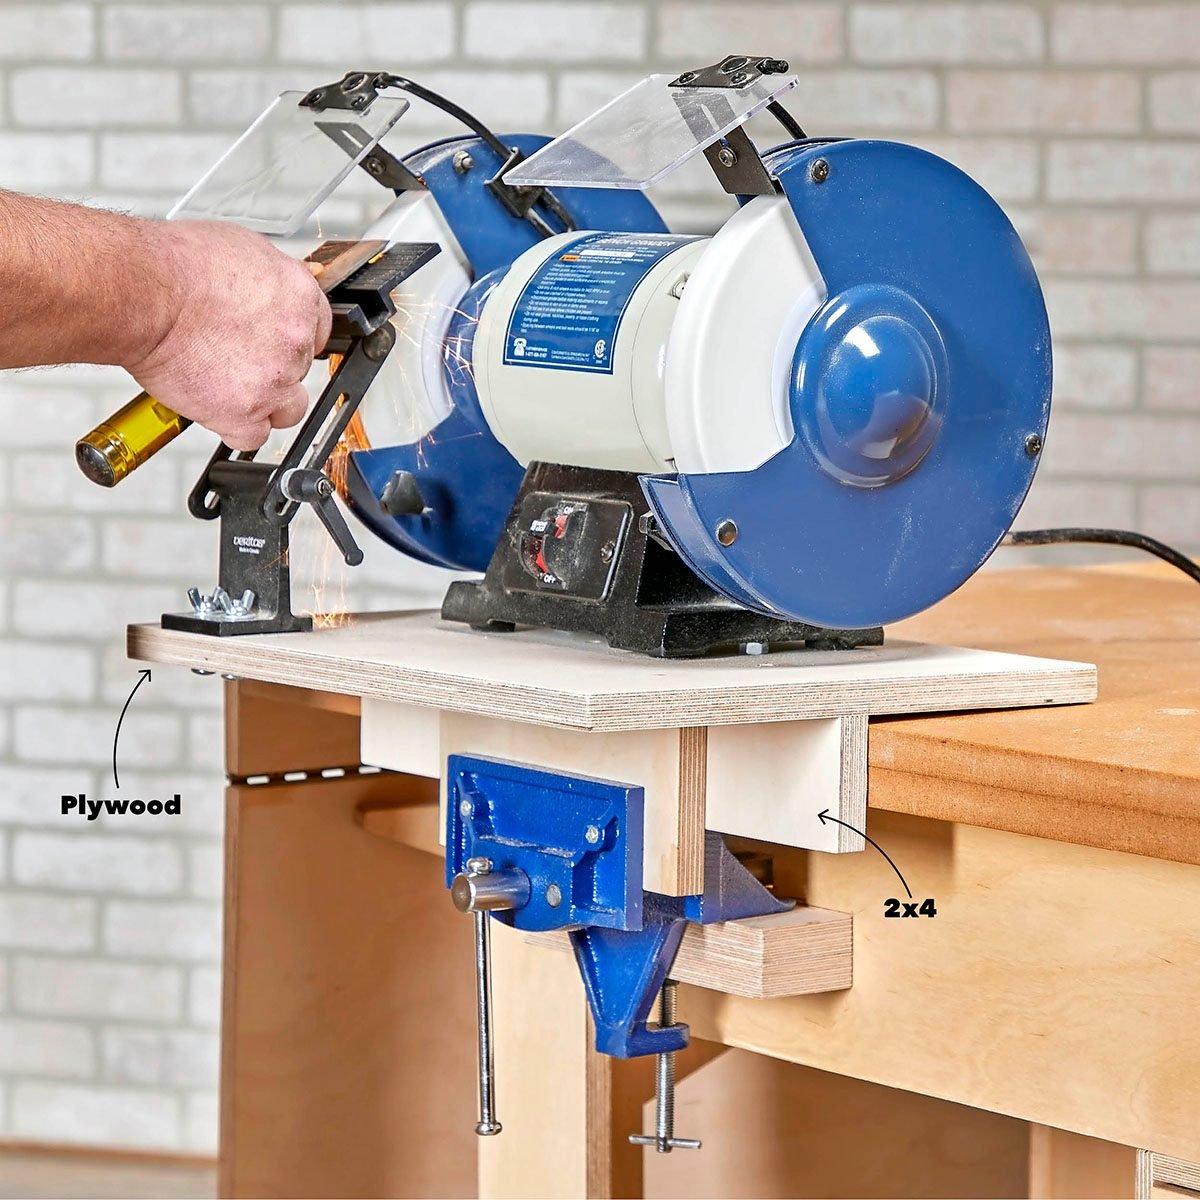 Make a portable tool mount